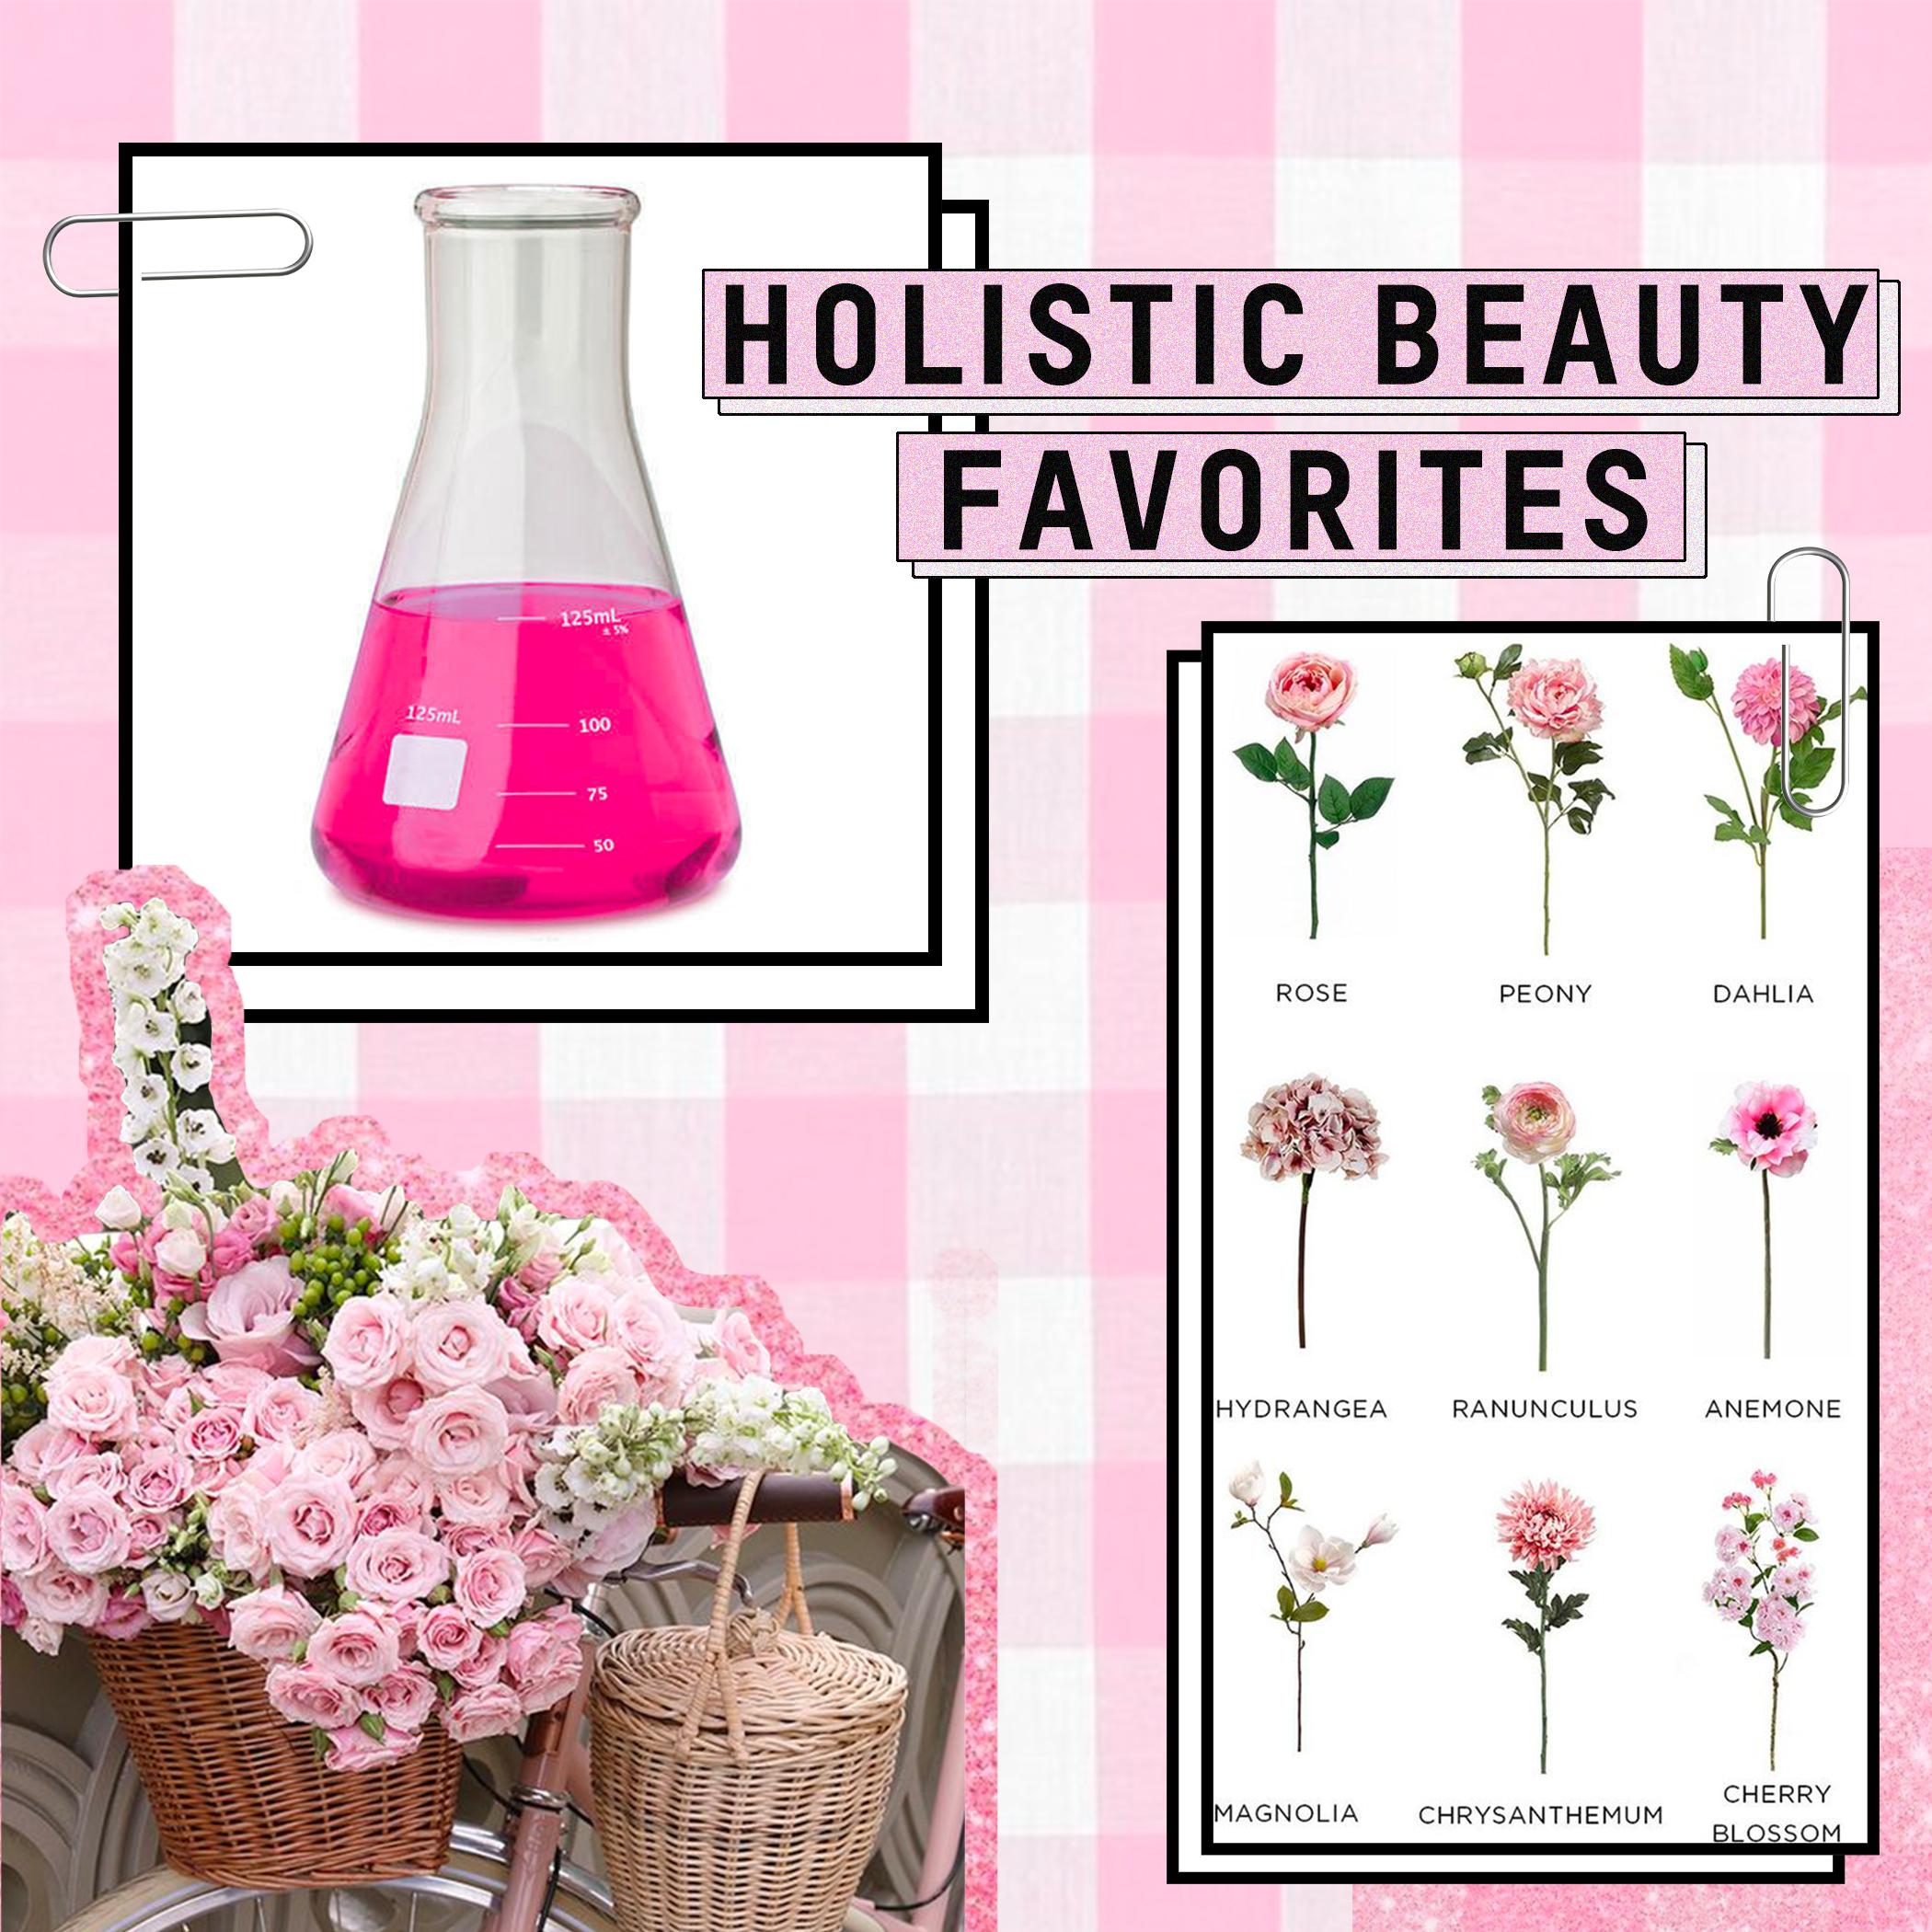 Holistic Beauty Tips and Tricks